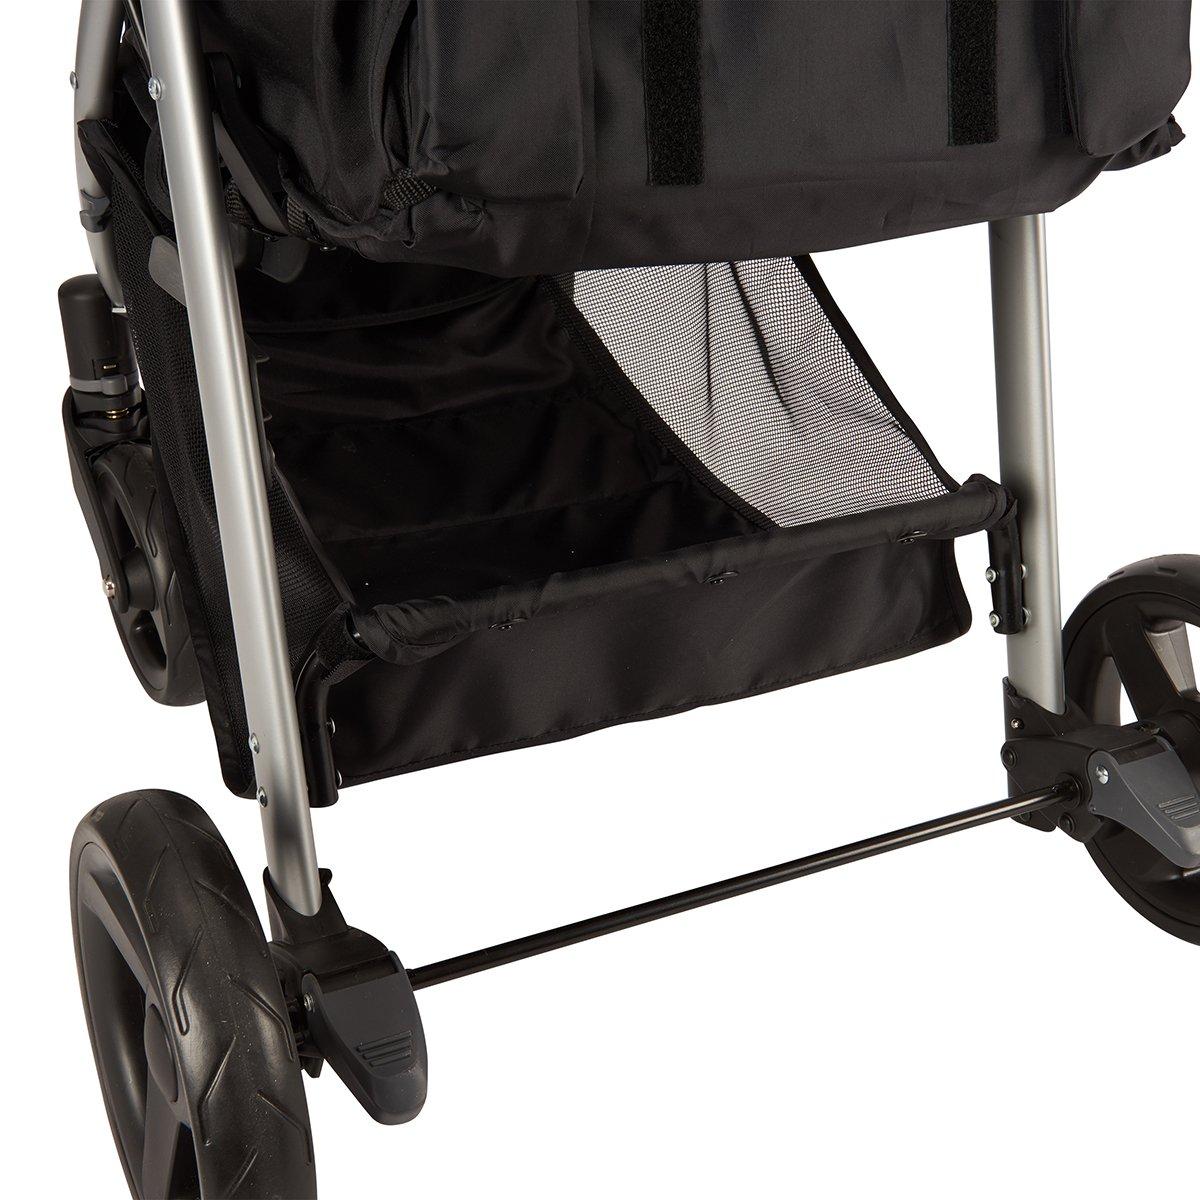 Evenflo FlipSide Travel System with LiteMax Infant Car Seat Glenbarr Grey 56422030C